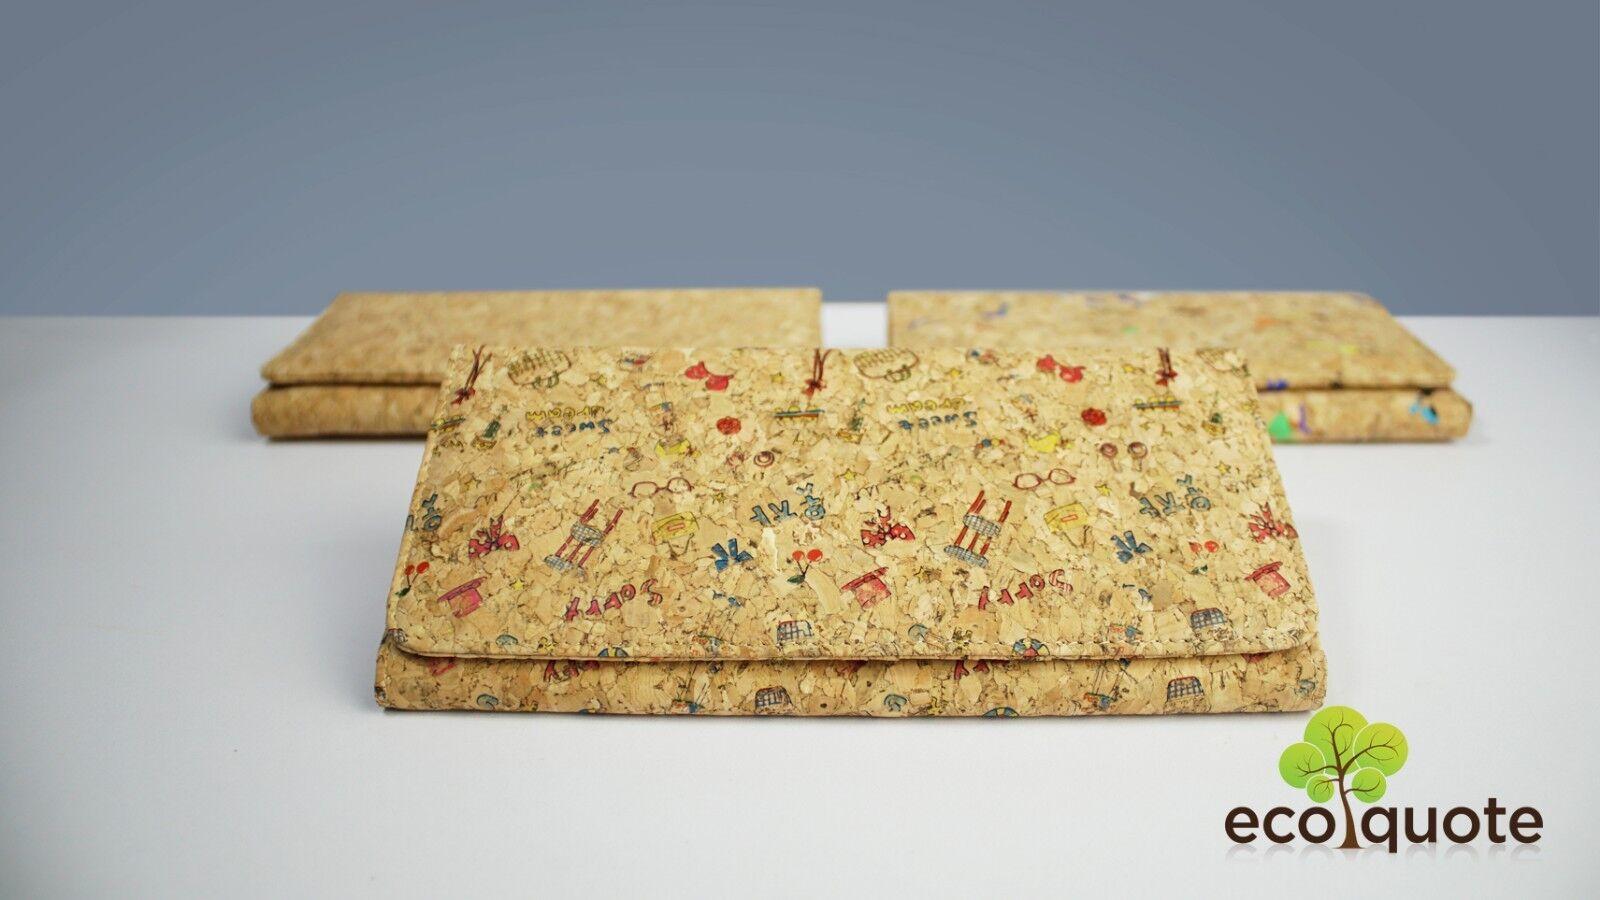 Cork Long Wallet 2 Zips Sq. Design Button Handmade Eco-Friendly Materials Vegan